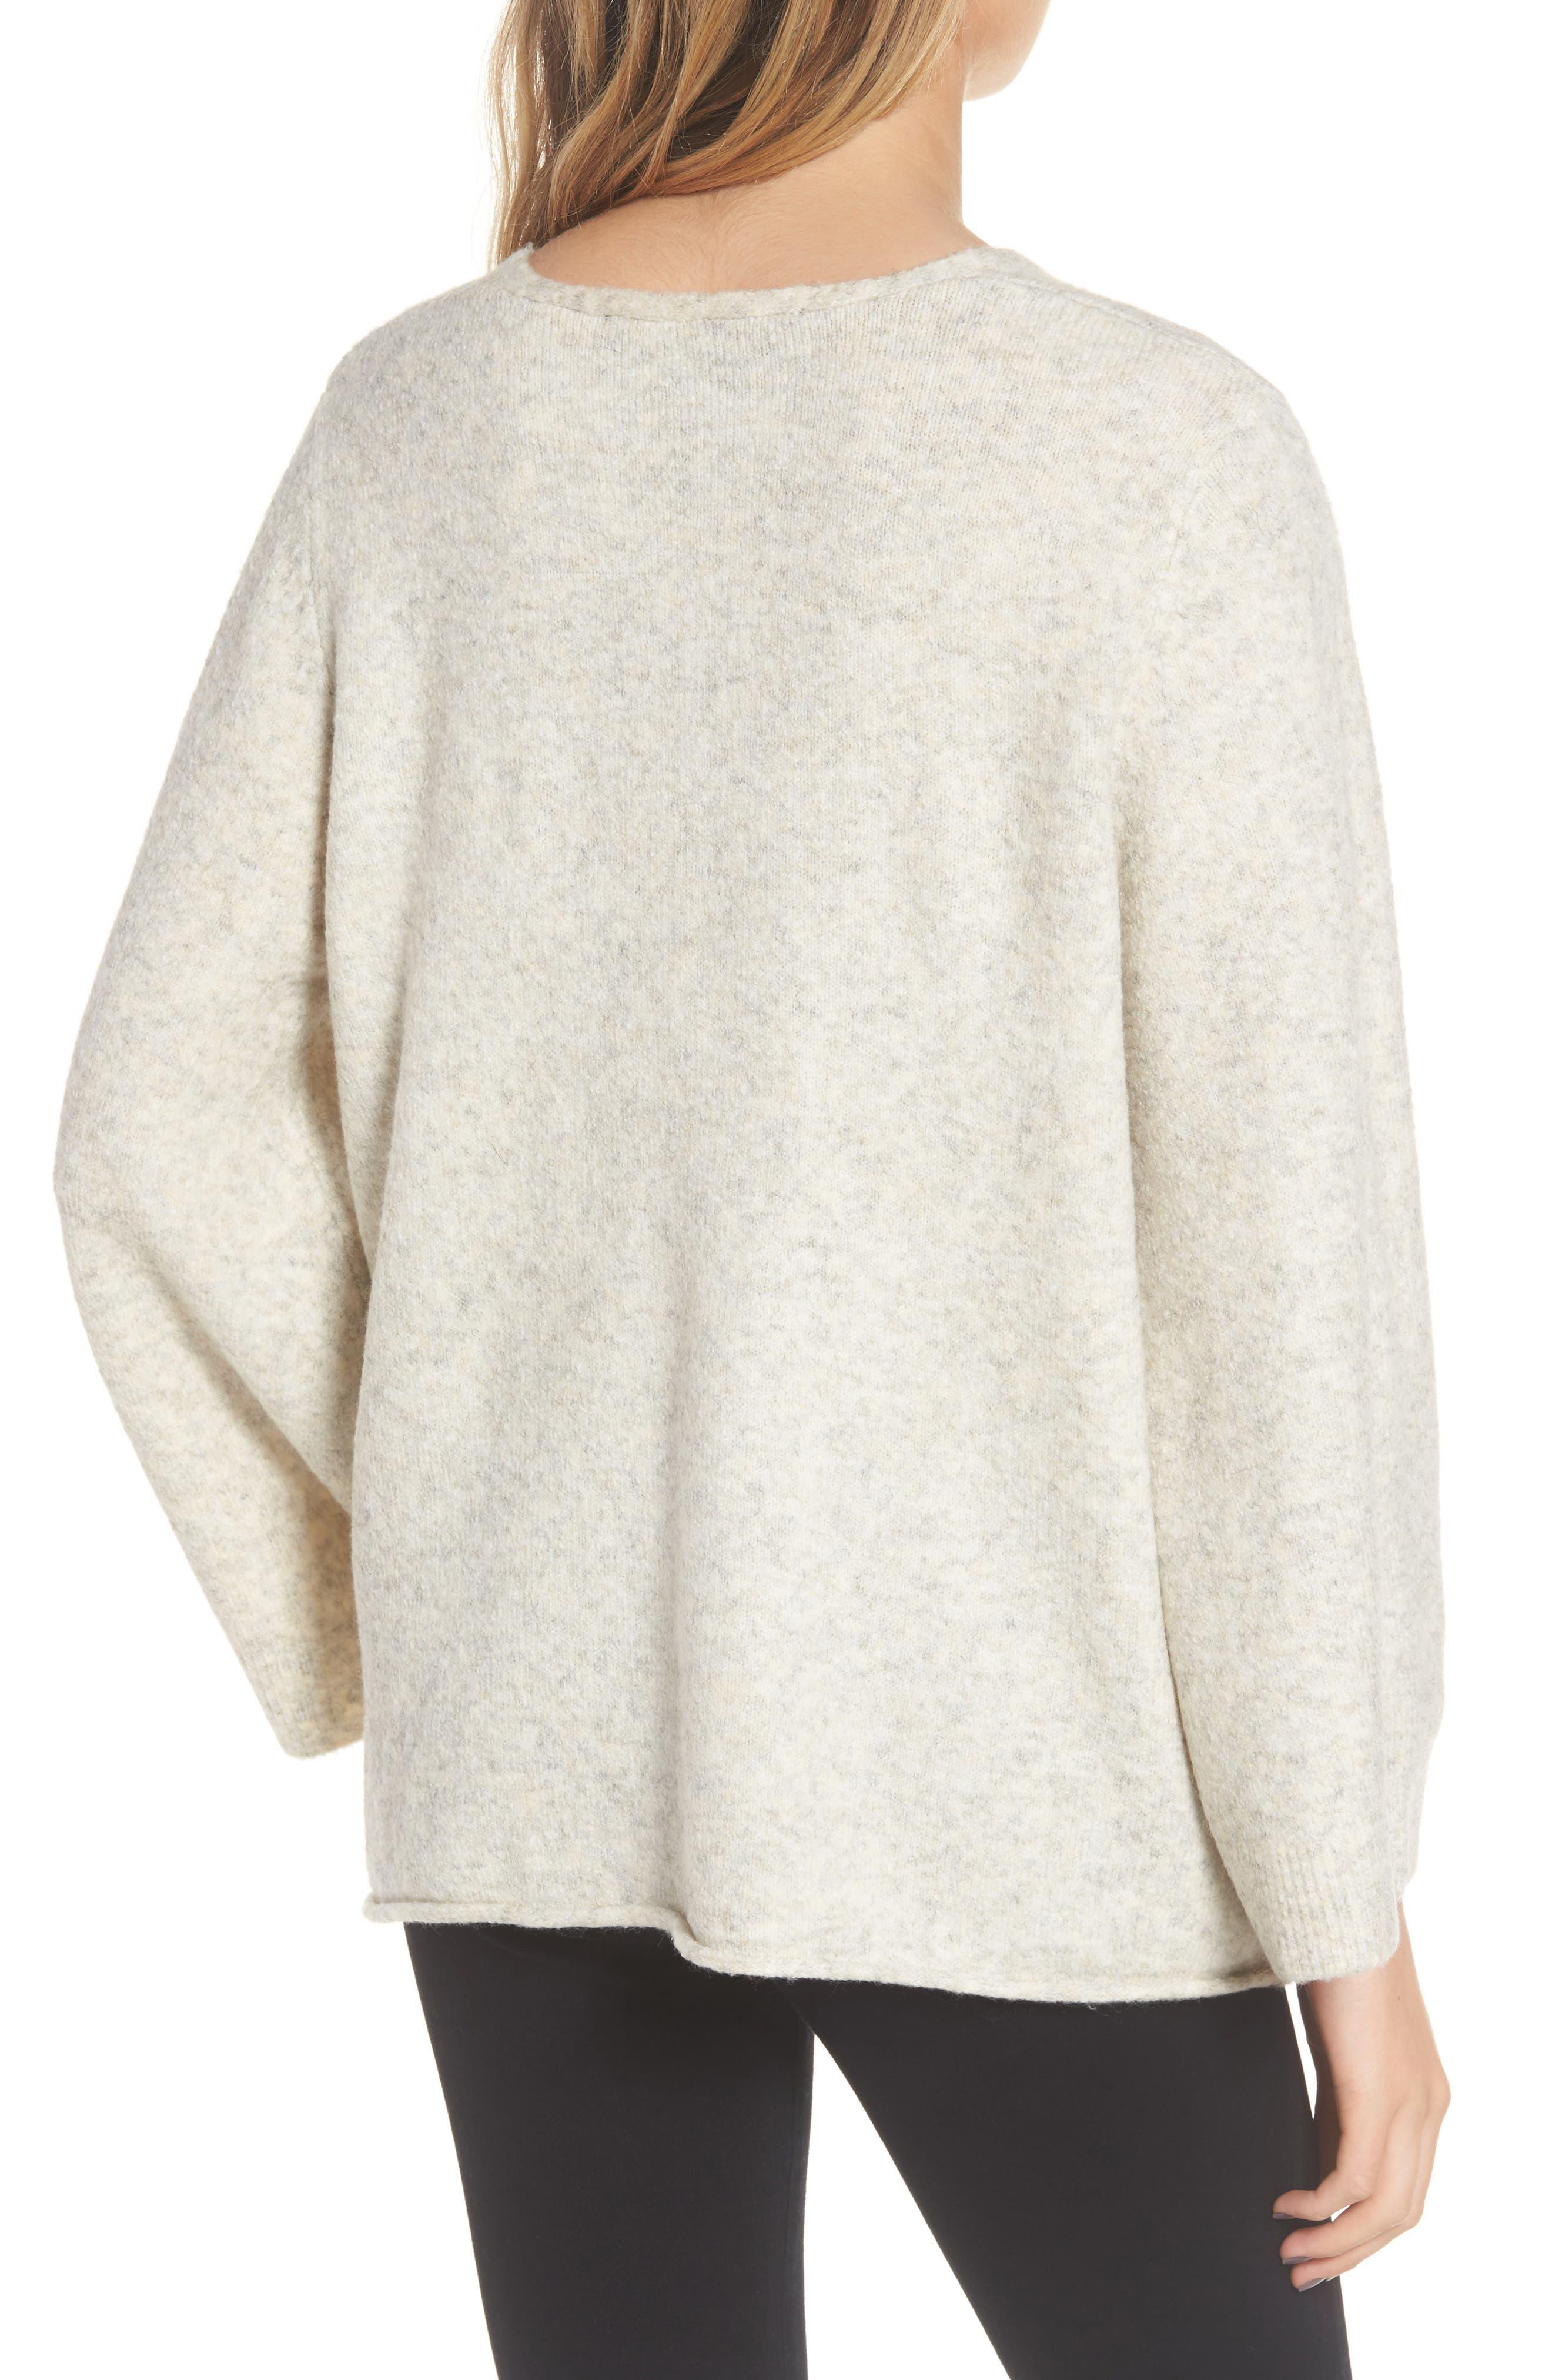 Urban Flossy Sweater,                             Alternate thumbnail 6, color,